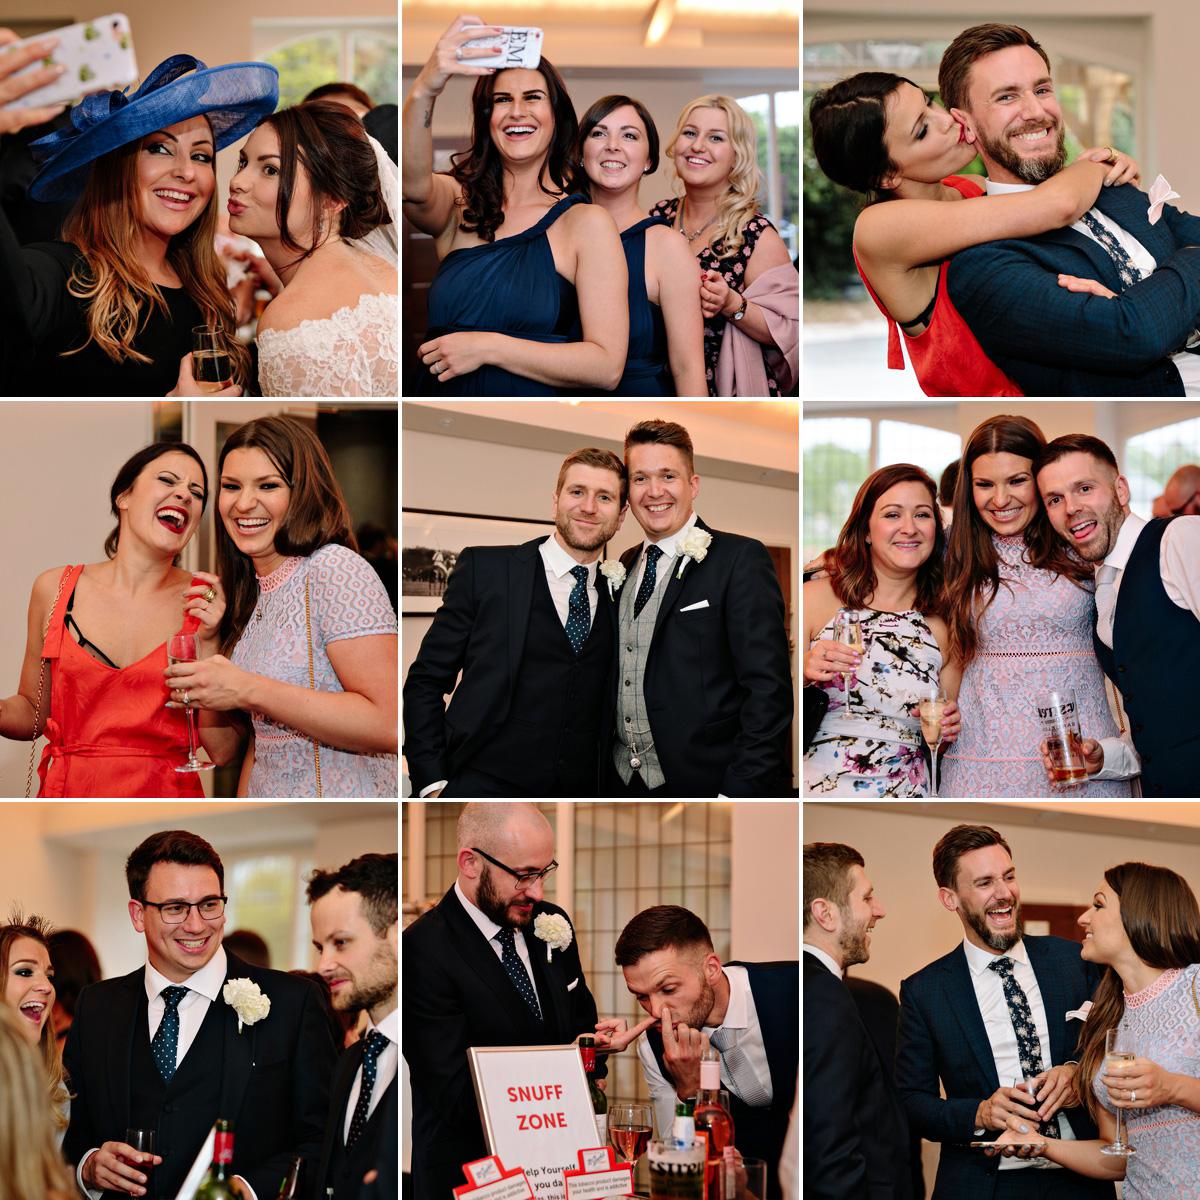 Wedding guests having fun, taking selfies